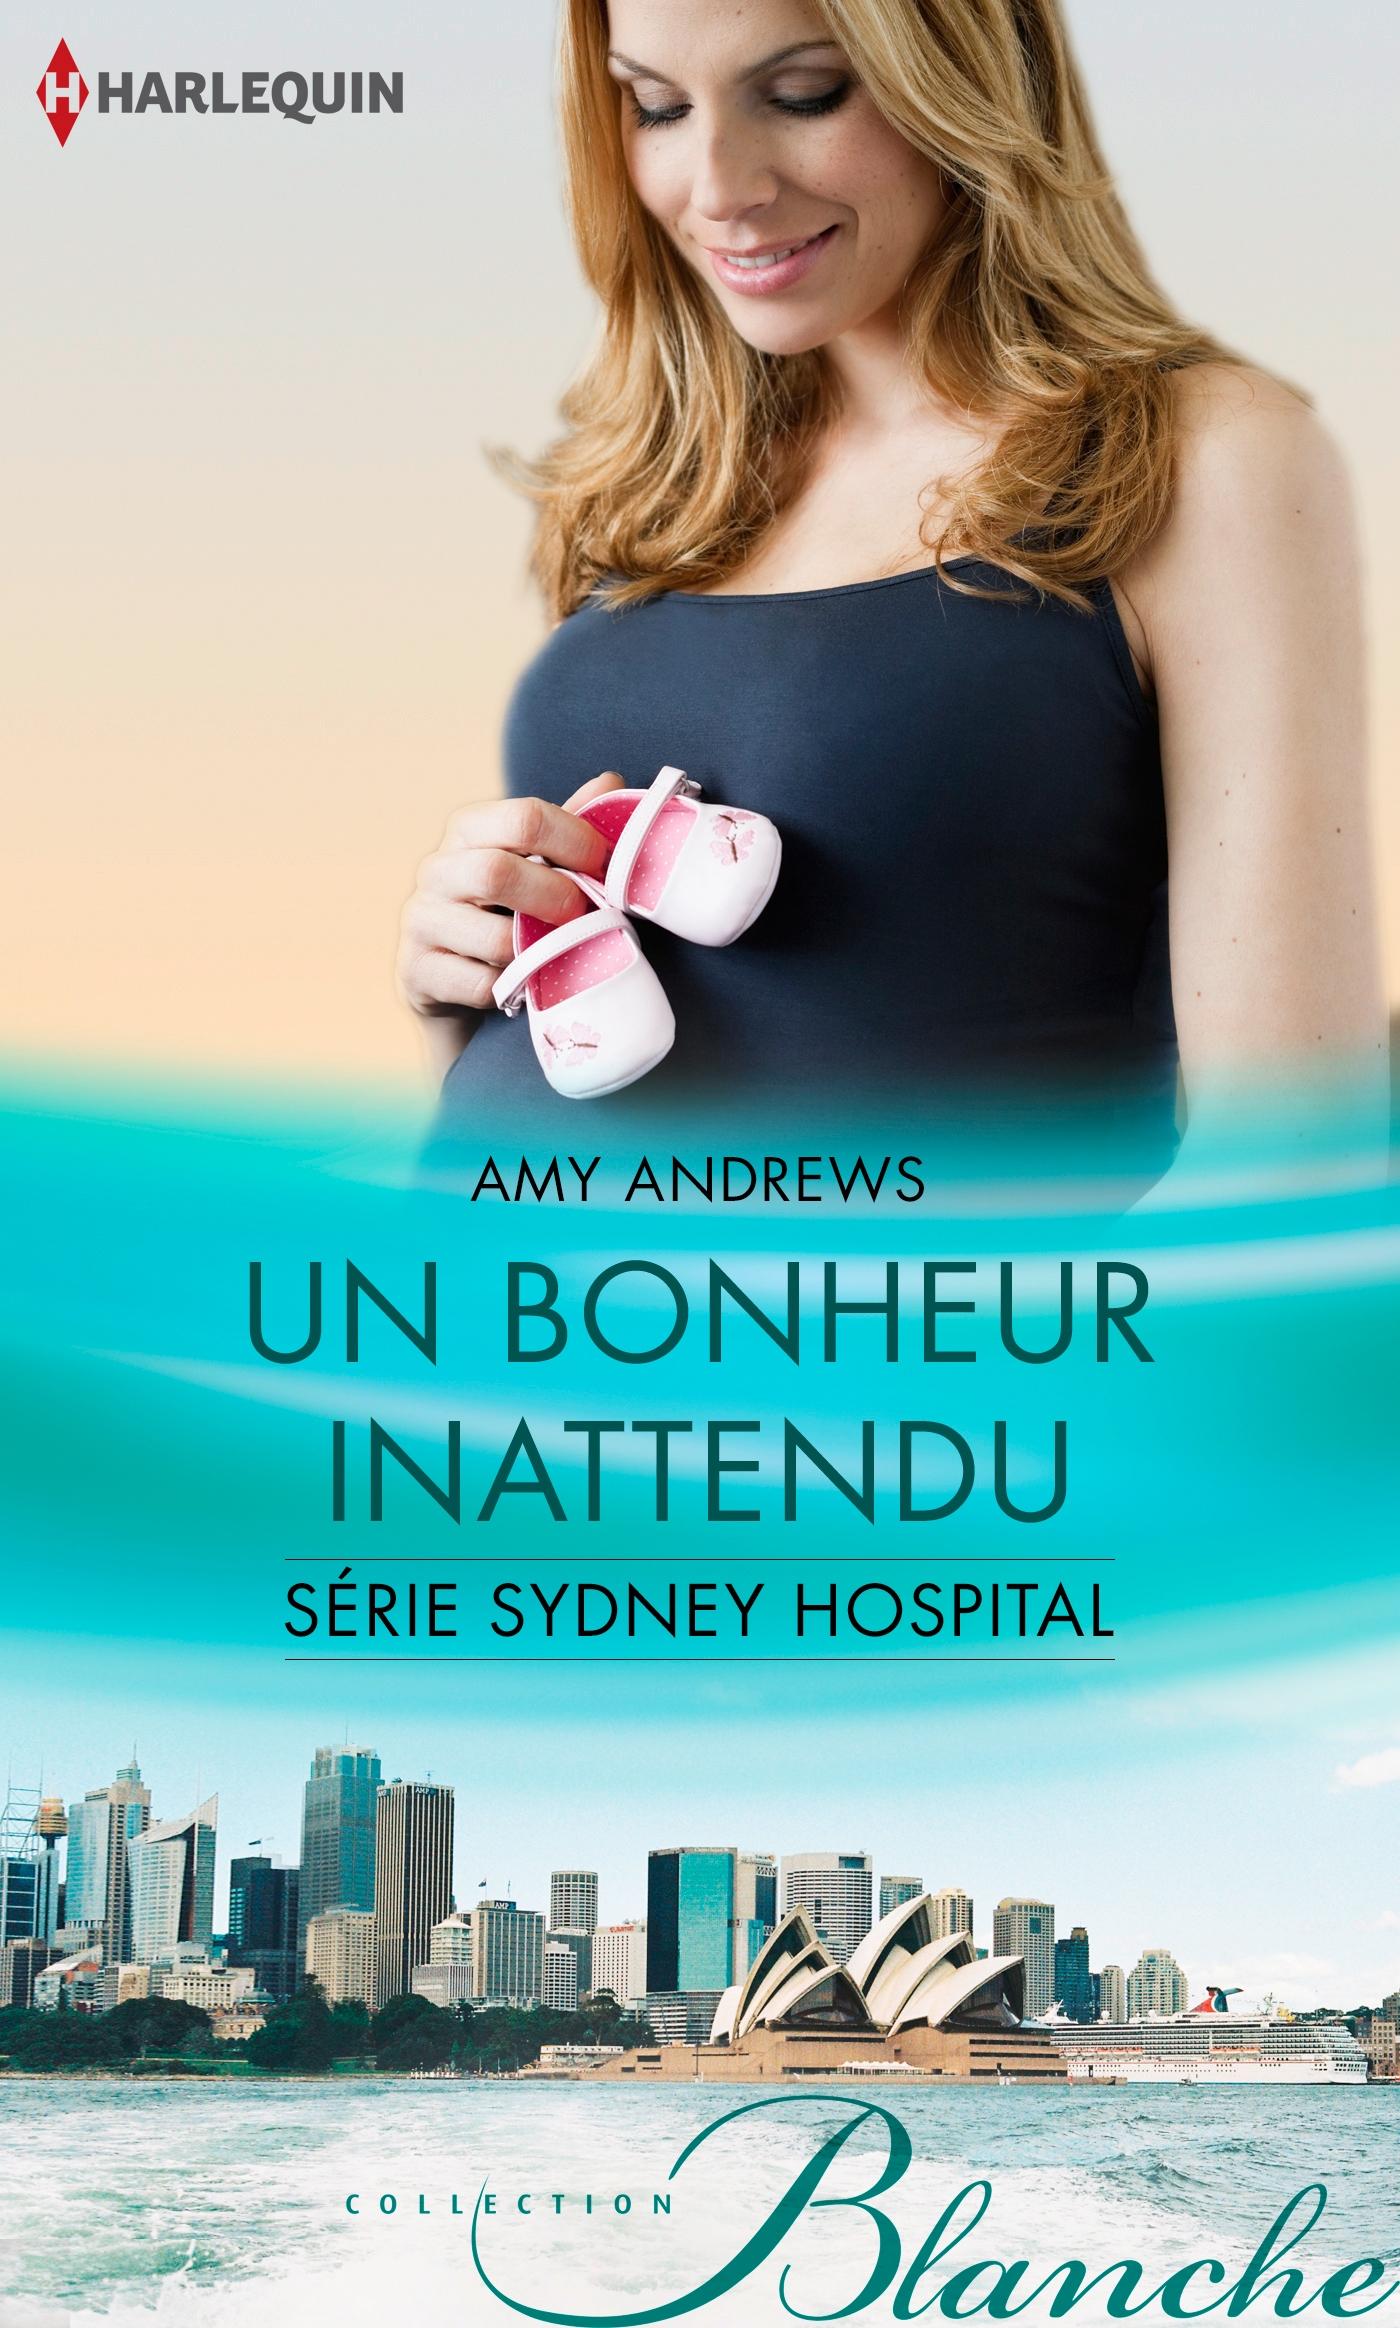 Sydney Hospital - Tome 9 : Un bonheur inattendu de Amy Andrews 9782280326643